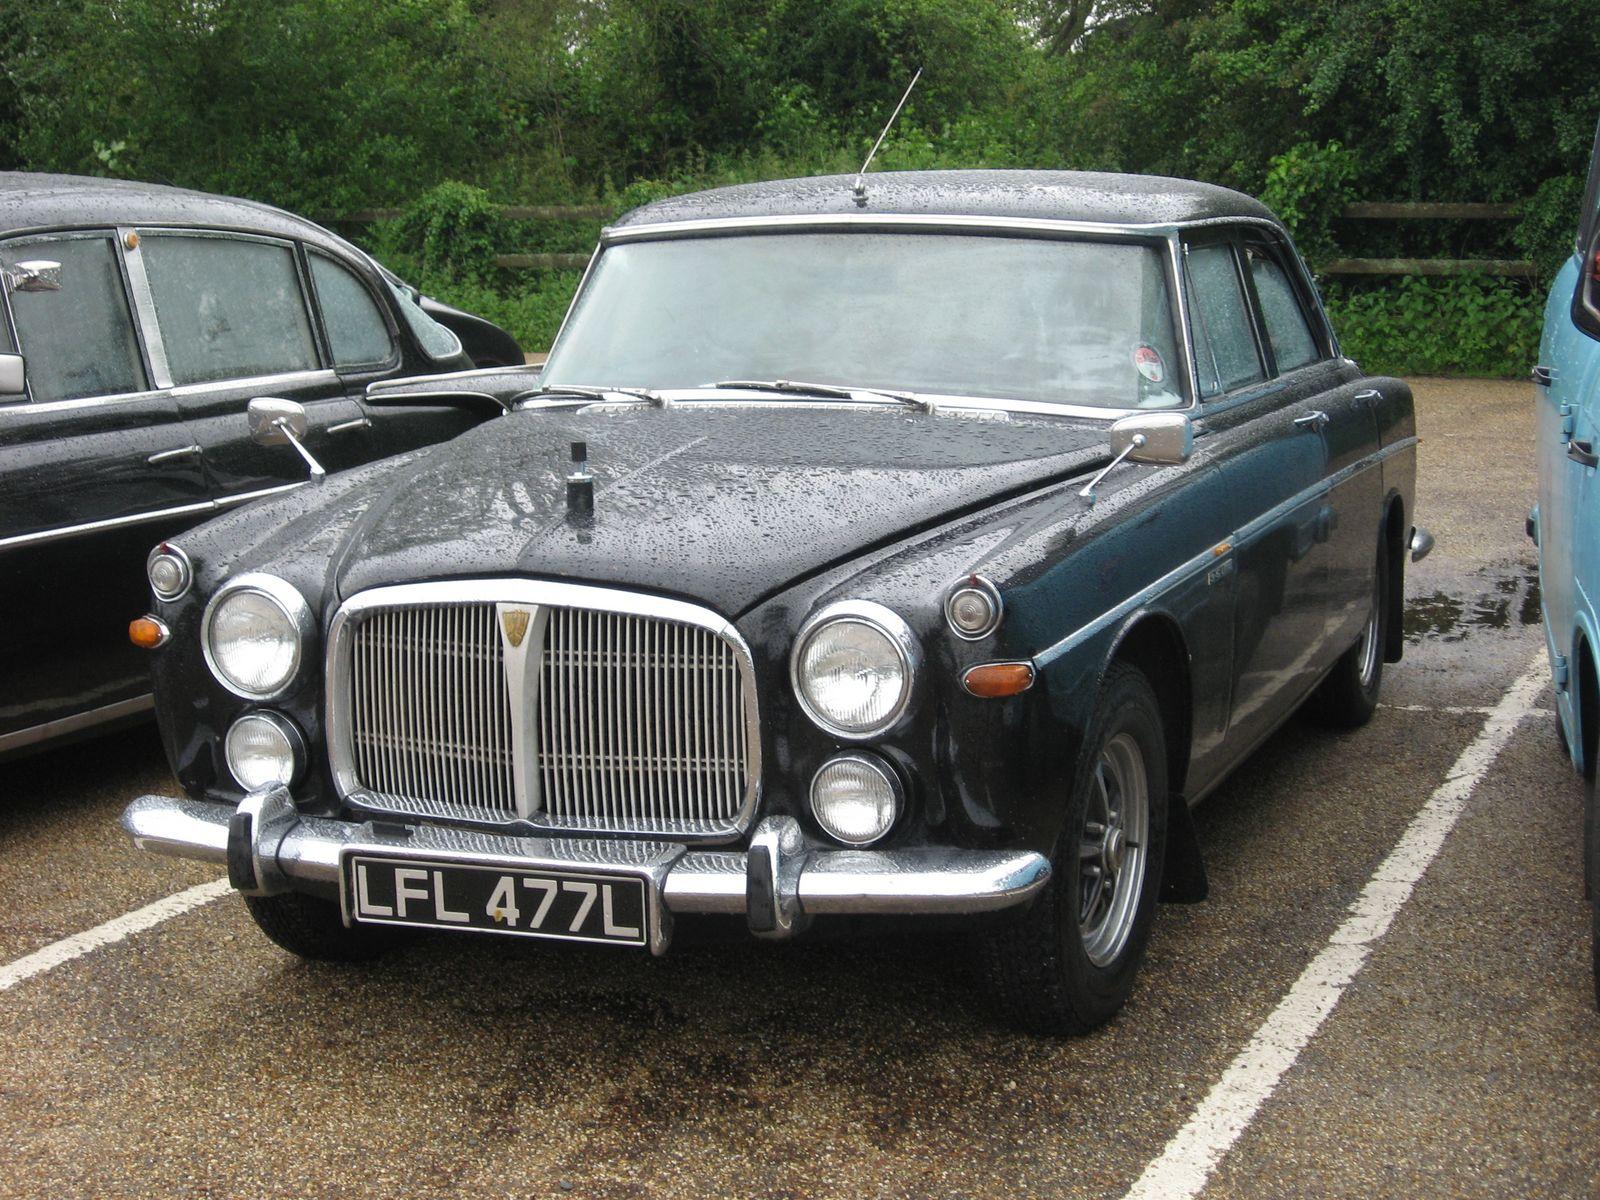 Malta Classic Car Collection